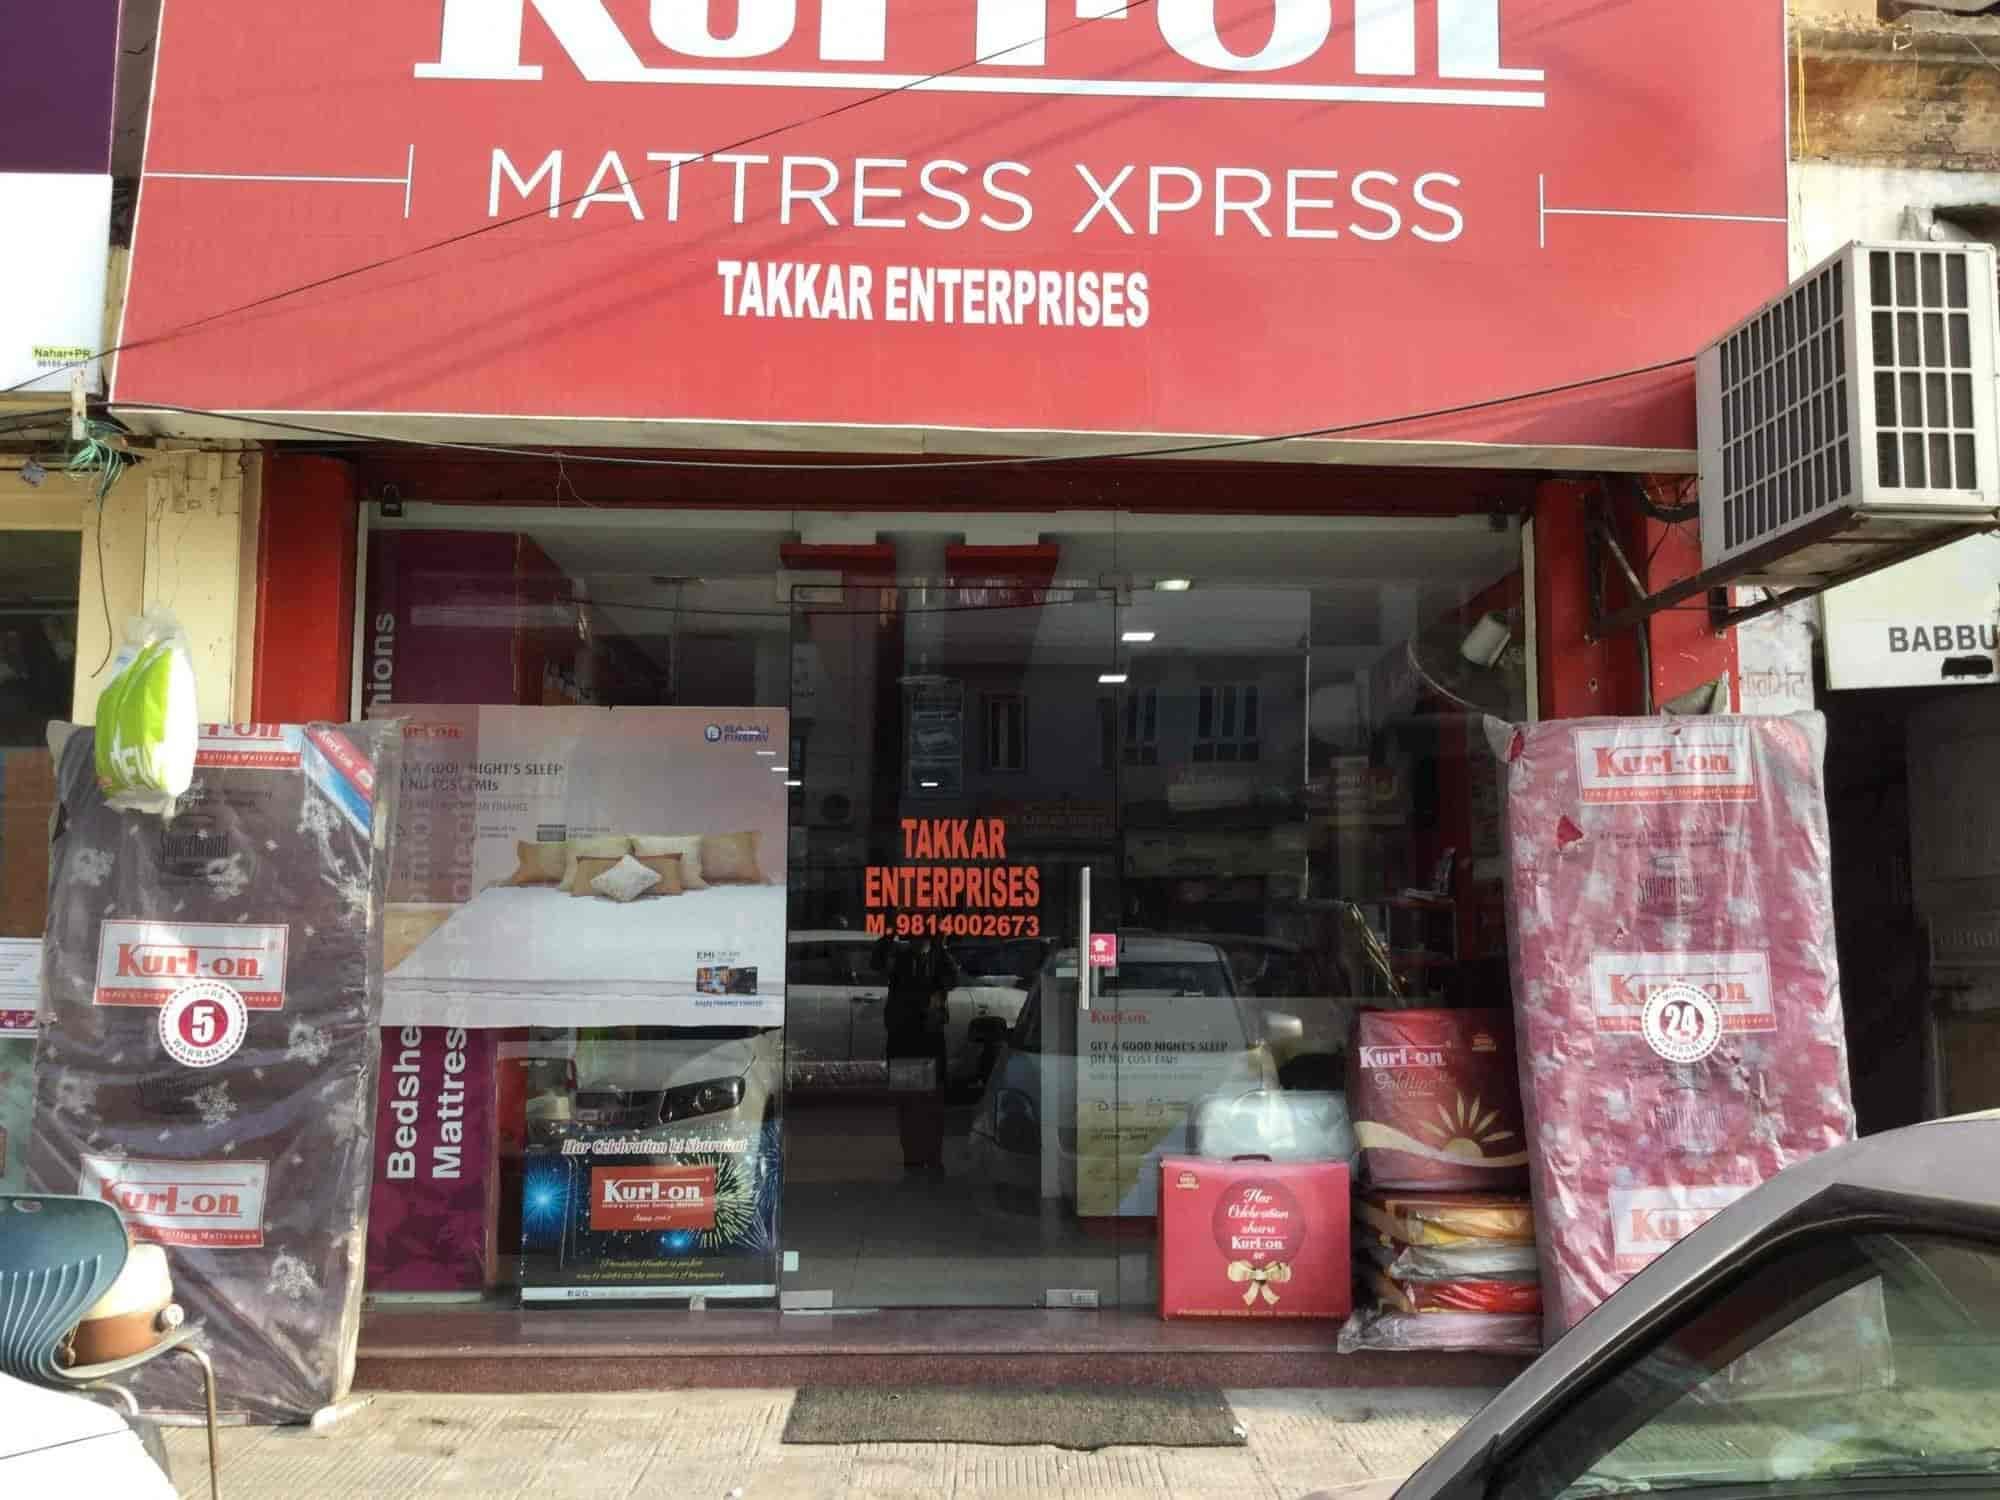 Top 10 Kurlon Mattress Dealers in Jalandhar City - Best